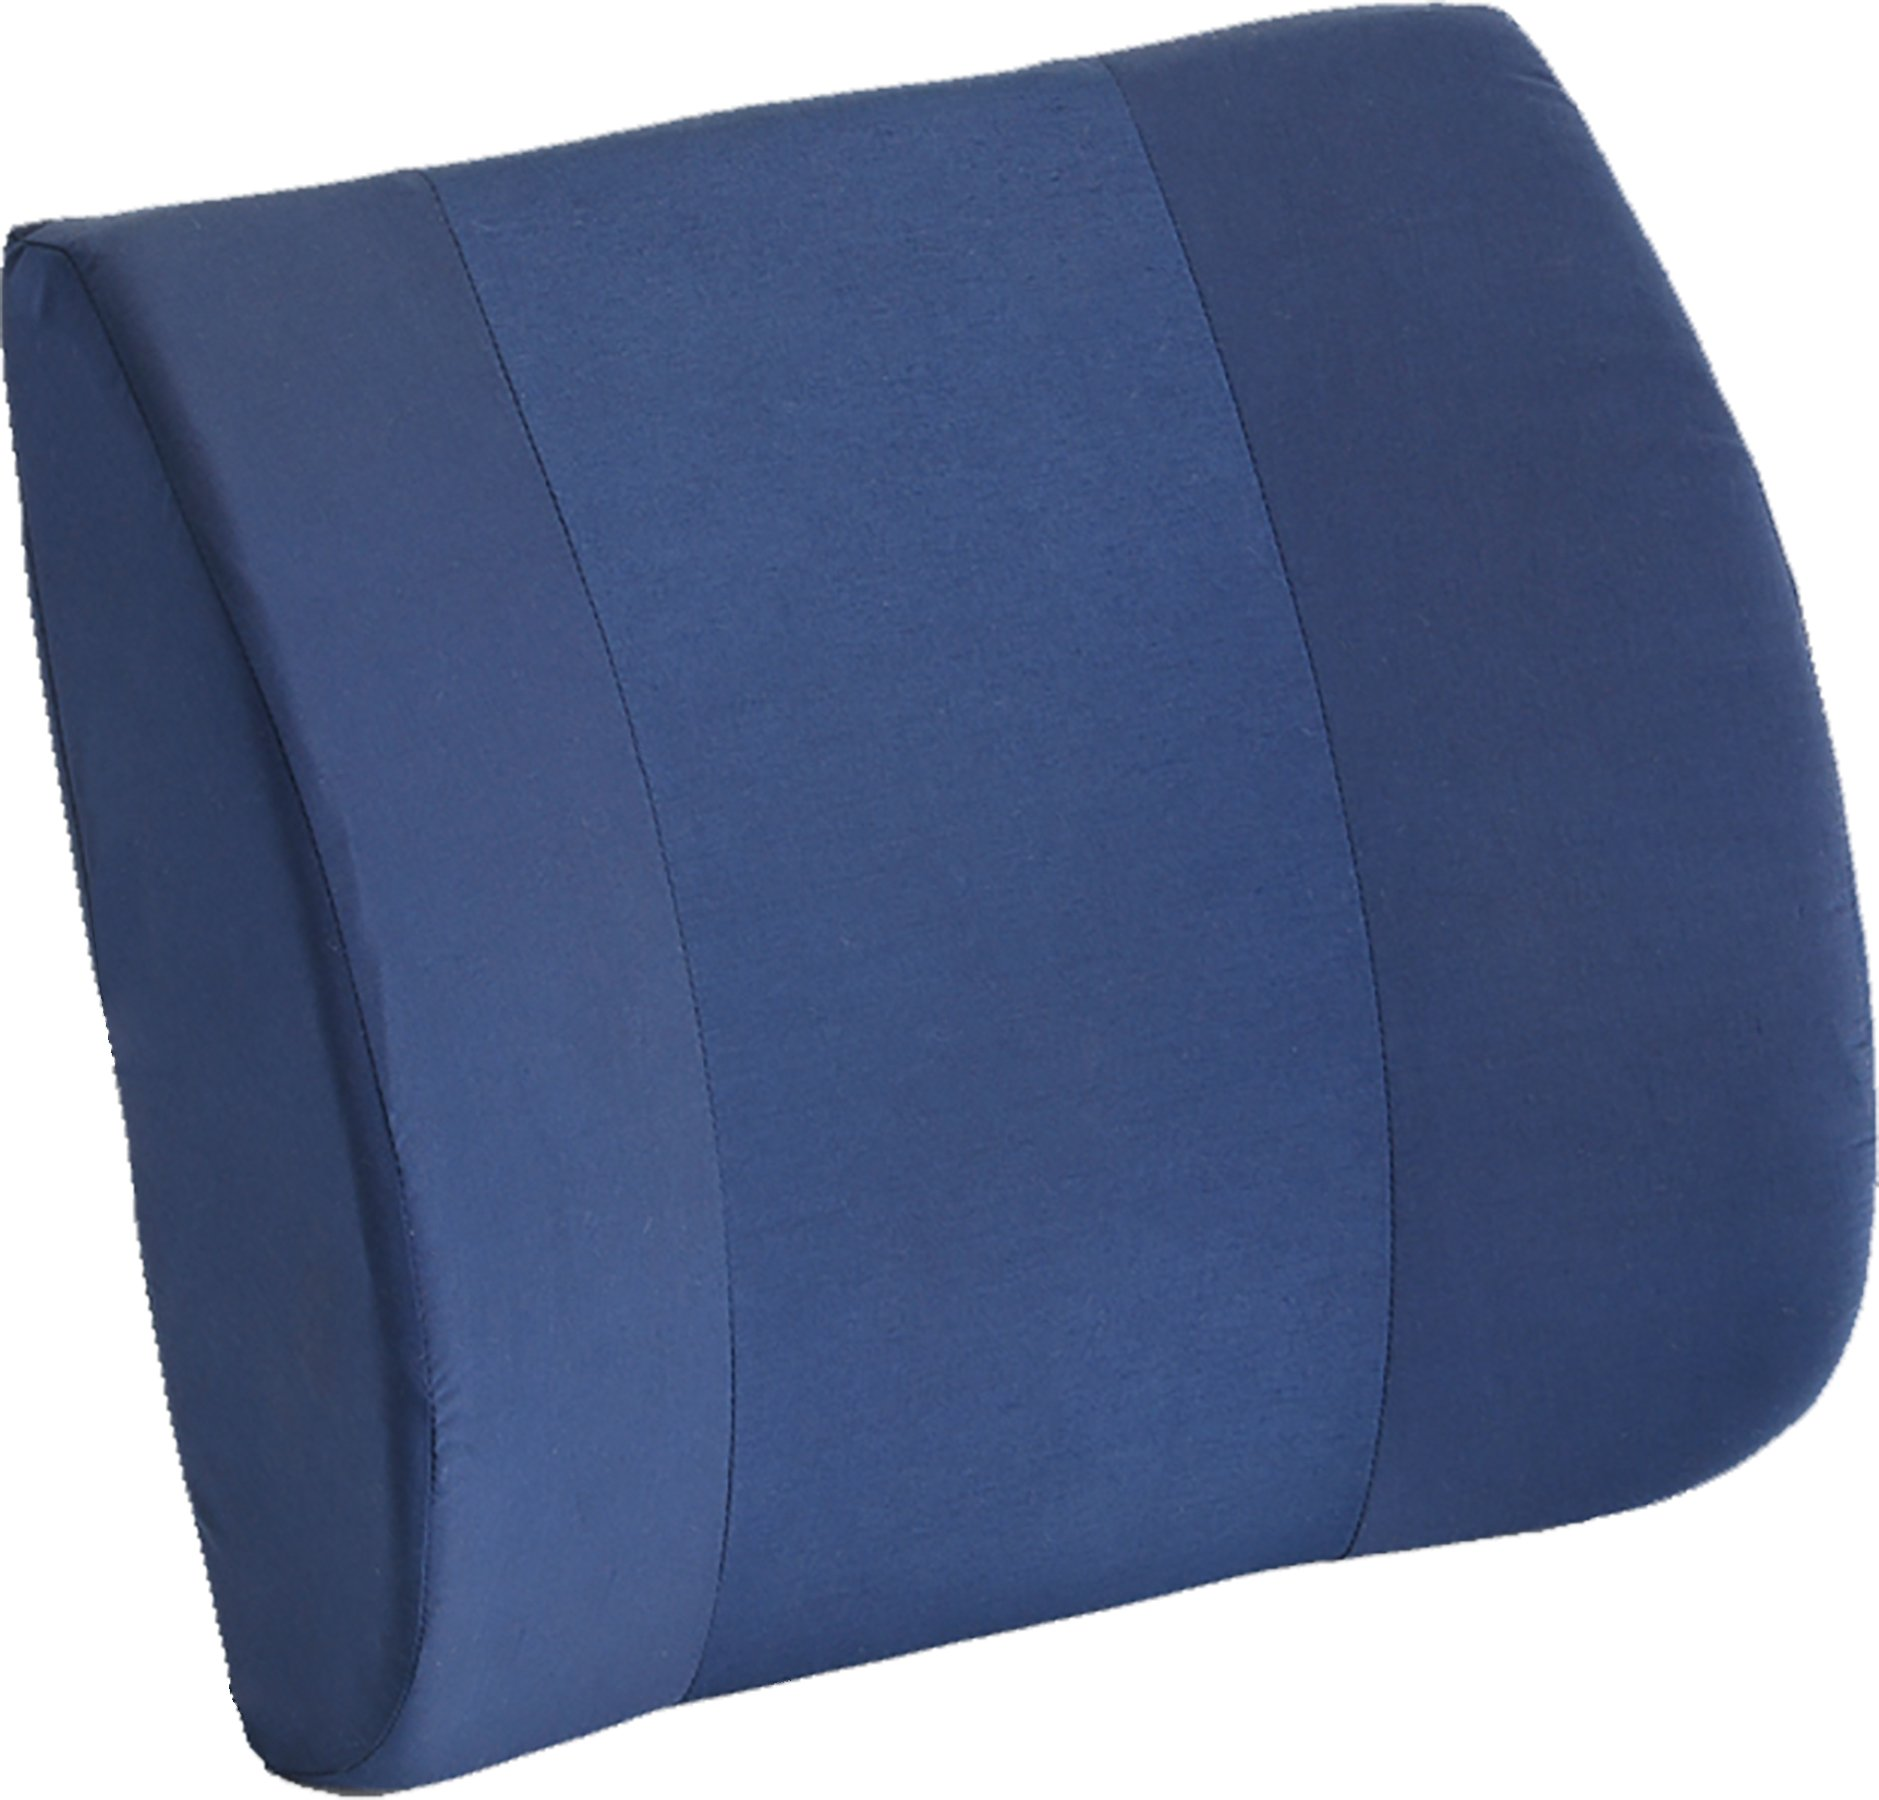 NOVA Medical Products Lumbar Back Cushion, Blue, 1.25 Pound